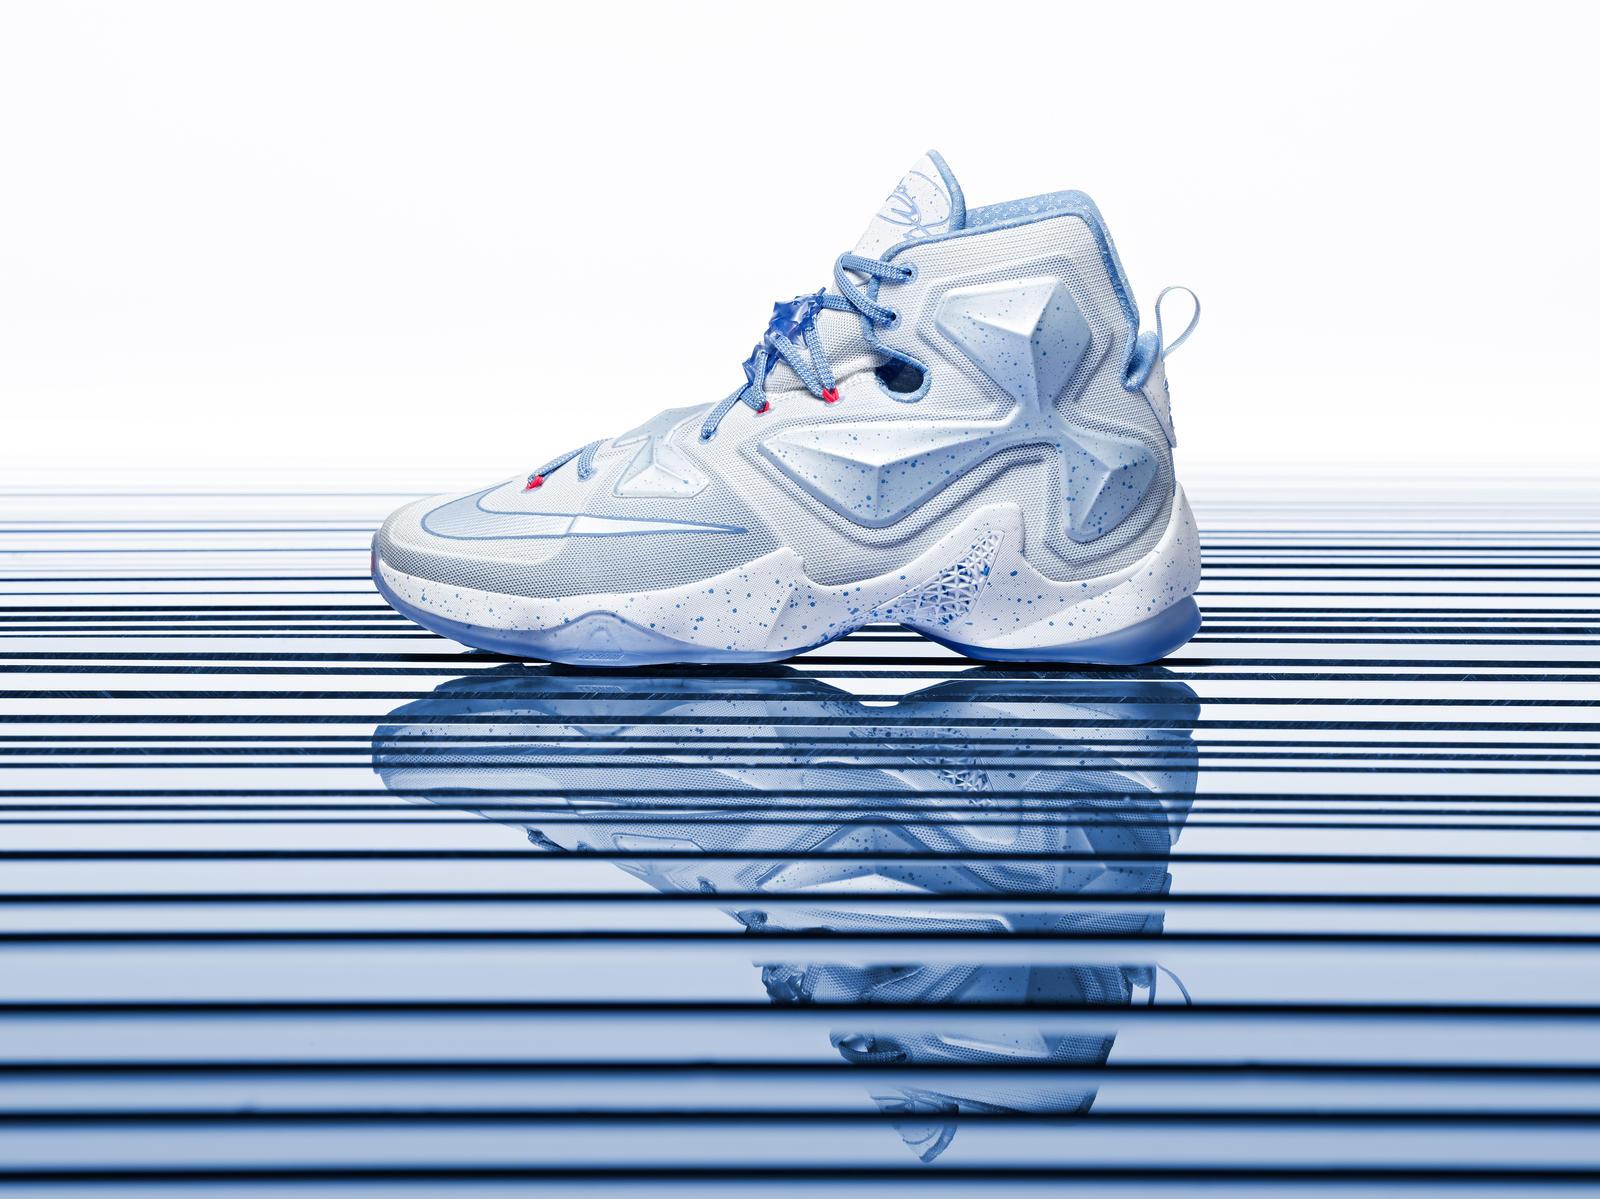 Nike LeBron 13 Christmas Pack